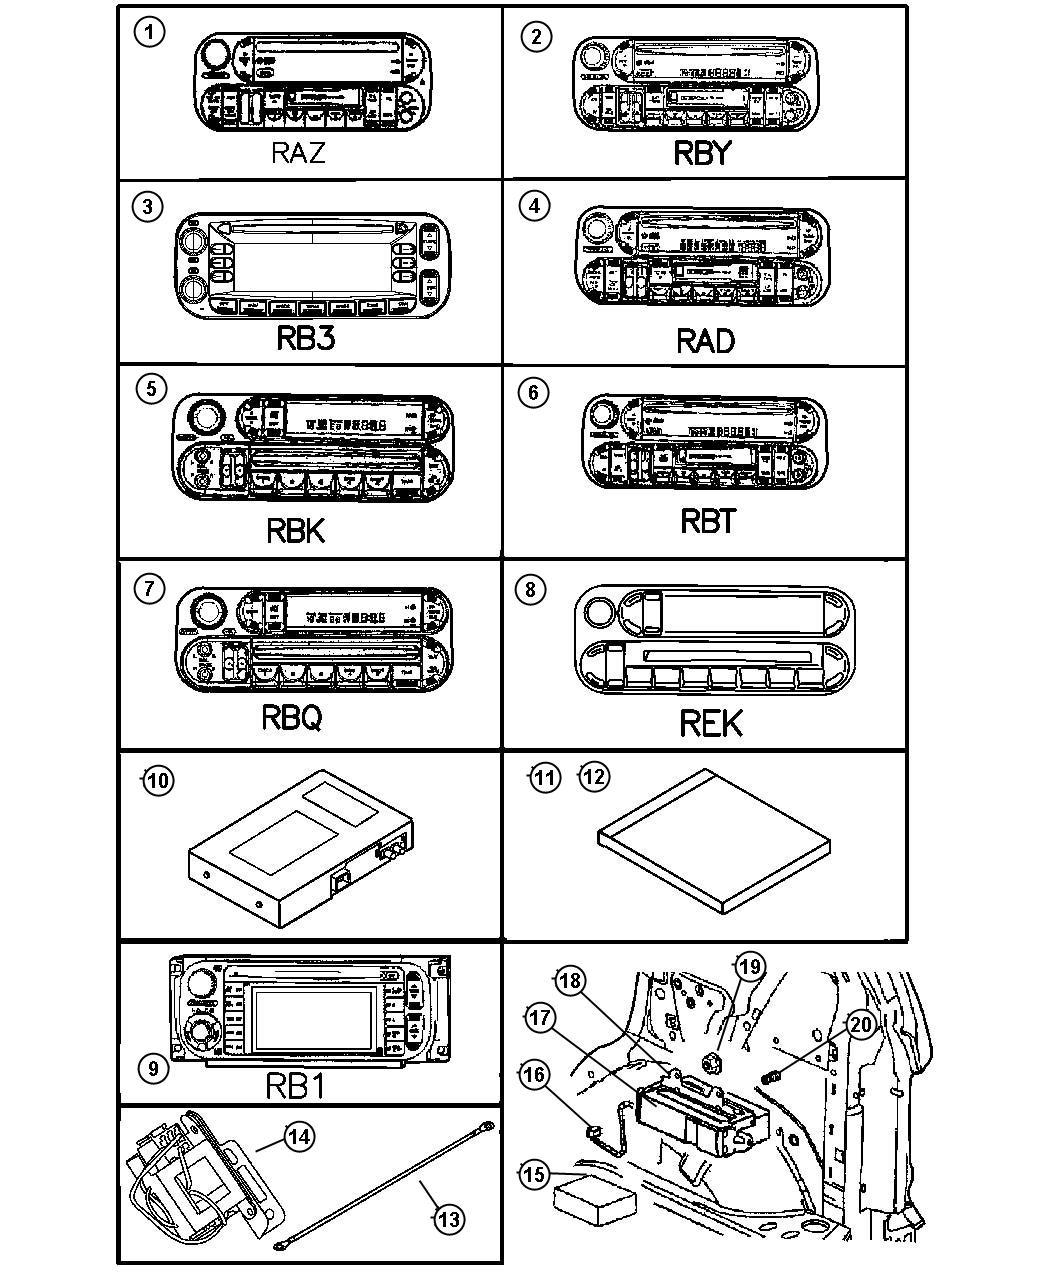 jeep grand cherokee trailer wiring harness, jeep liberty vacuum line diagram, jeep liberty pulley diagram, jeep liberty hitch wiring, jeep liberty serpentine belt diagram, jeep liberty timing chain diagram, 2004 jeep wrangler diagram, jeep liberty radio harness diagram, jeep wrangler ac wiring diagram, 2000 jeep cherokee sport wiring diagram, jeep wrangler trailer wiring, jeep liberty 3.7 engine diagram, 2011 wrangler wiring diagram, jeep liberty electrical diagram, jeep liberty ignition wiring, jeep liberty hose diagram, jeep liberty front end diagram, jeep liberty ac wiring diagram, jeep liberty engine swap, 1996 jeep cherokee fuel pump wiring diagram, on 3 7l jeep liberty wiring harness diagram